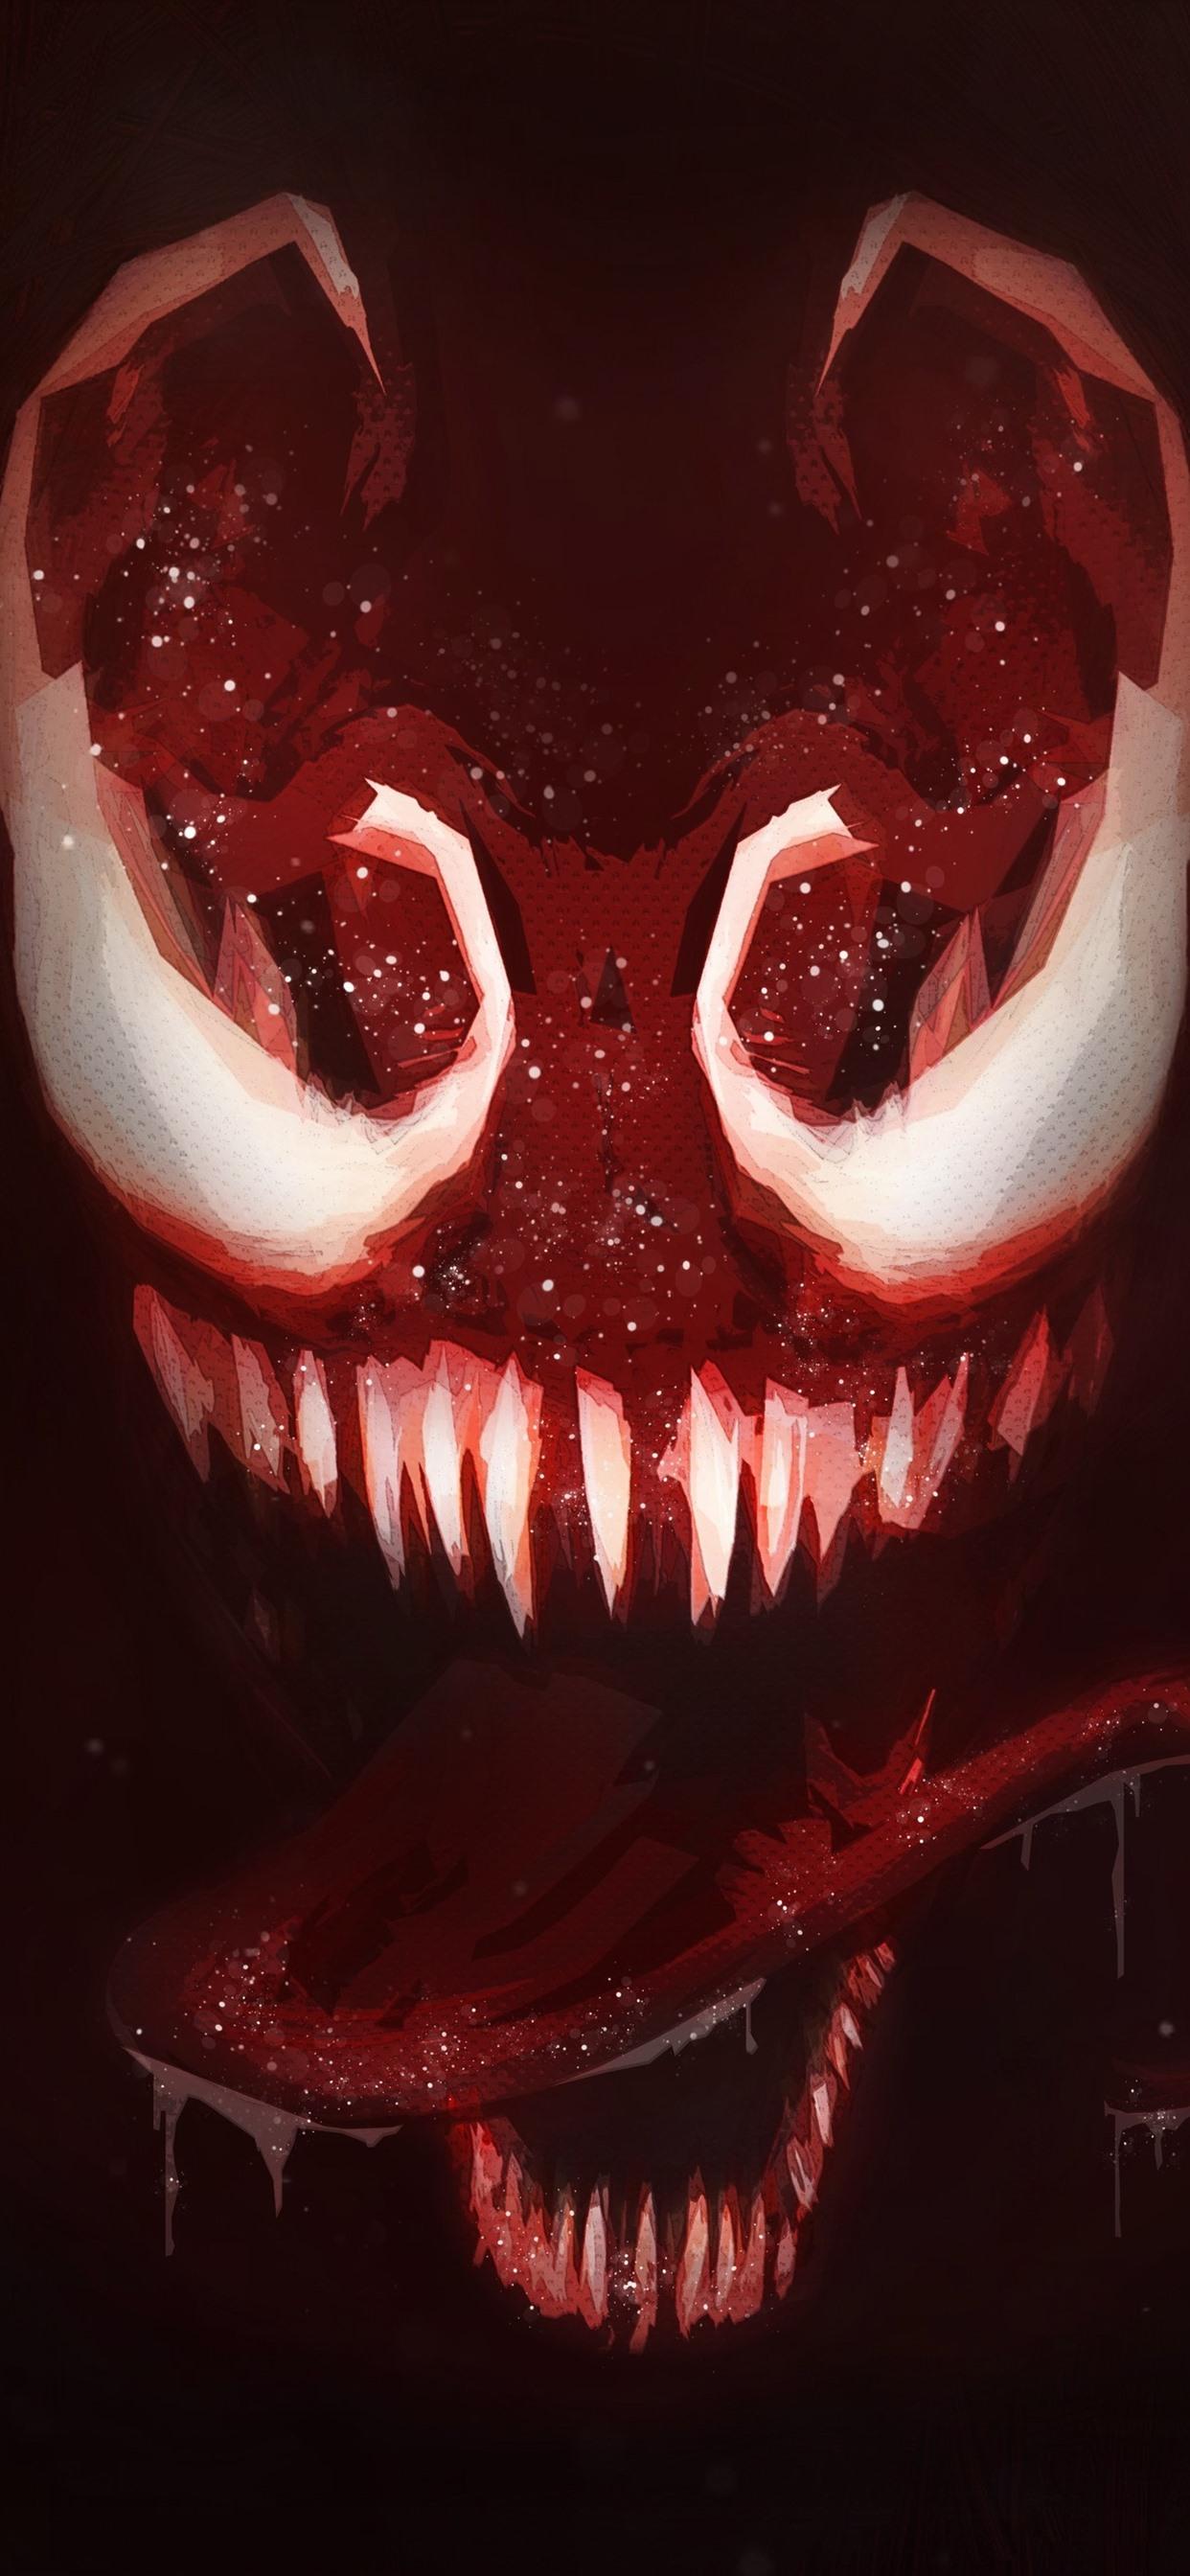 Venom Teeth Horror Art Picture 1242x2688 Iphone Xs Max